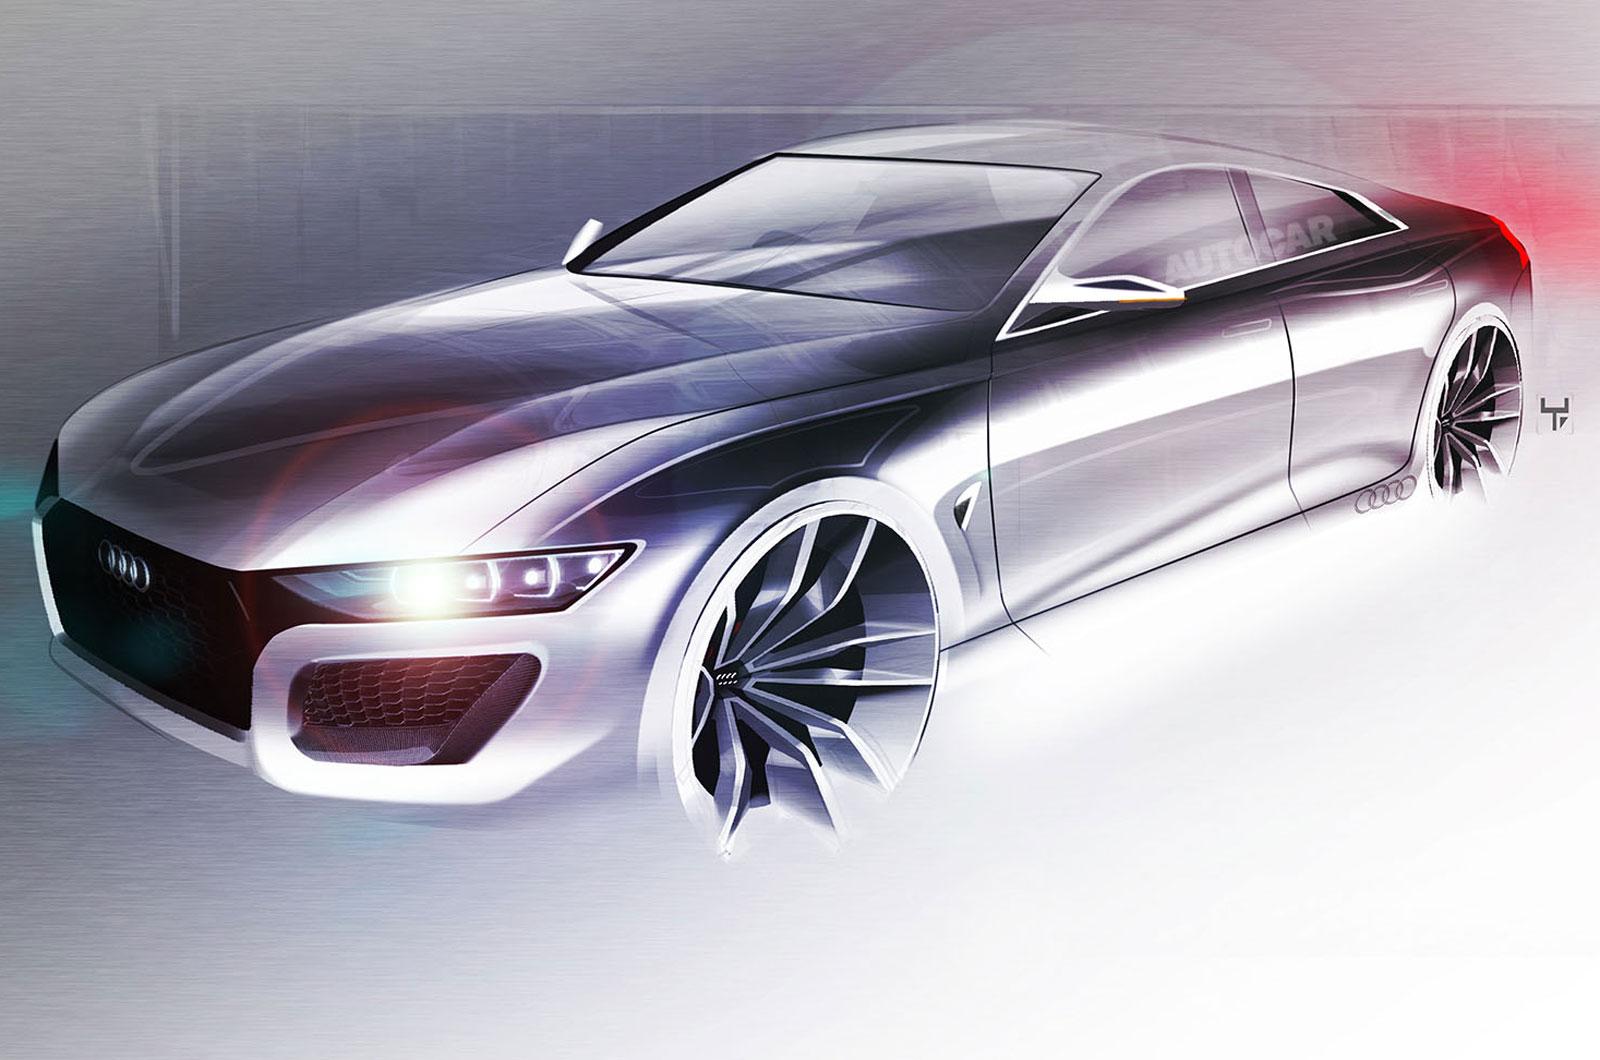 Future Audi S9 Could Deliver 600hp - GTspirit